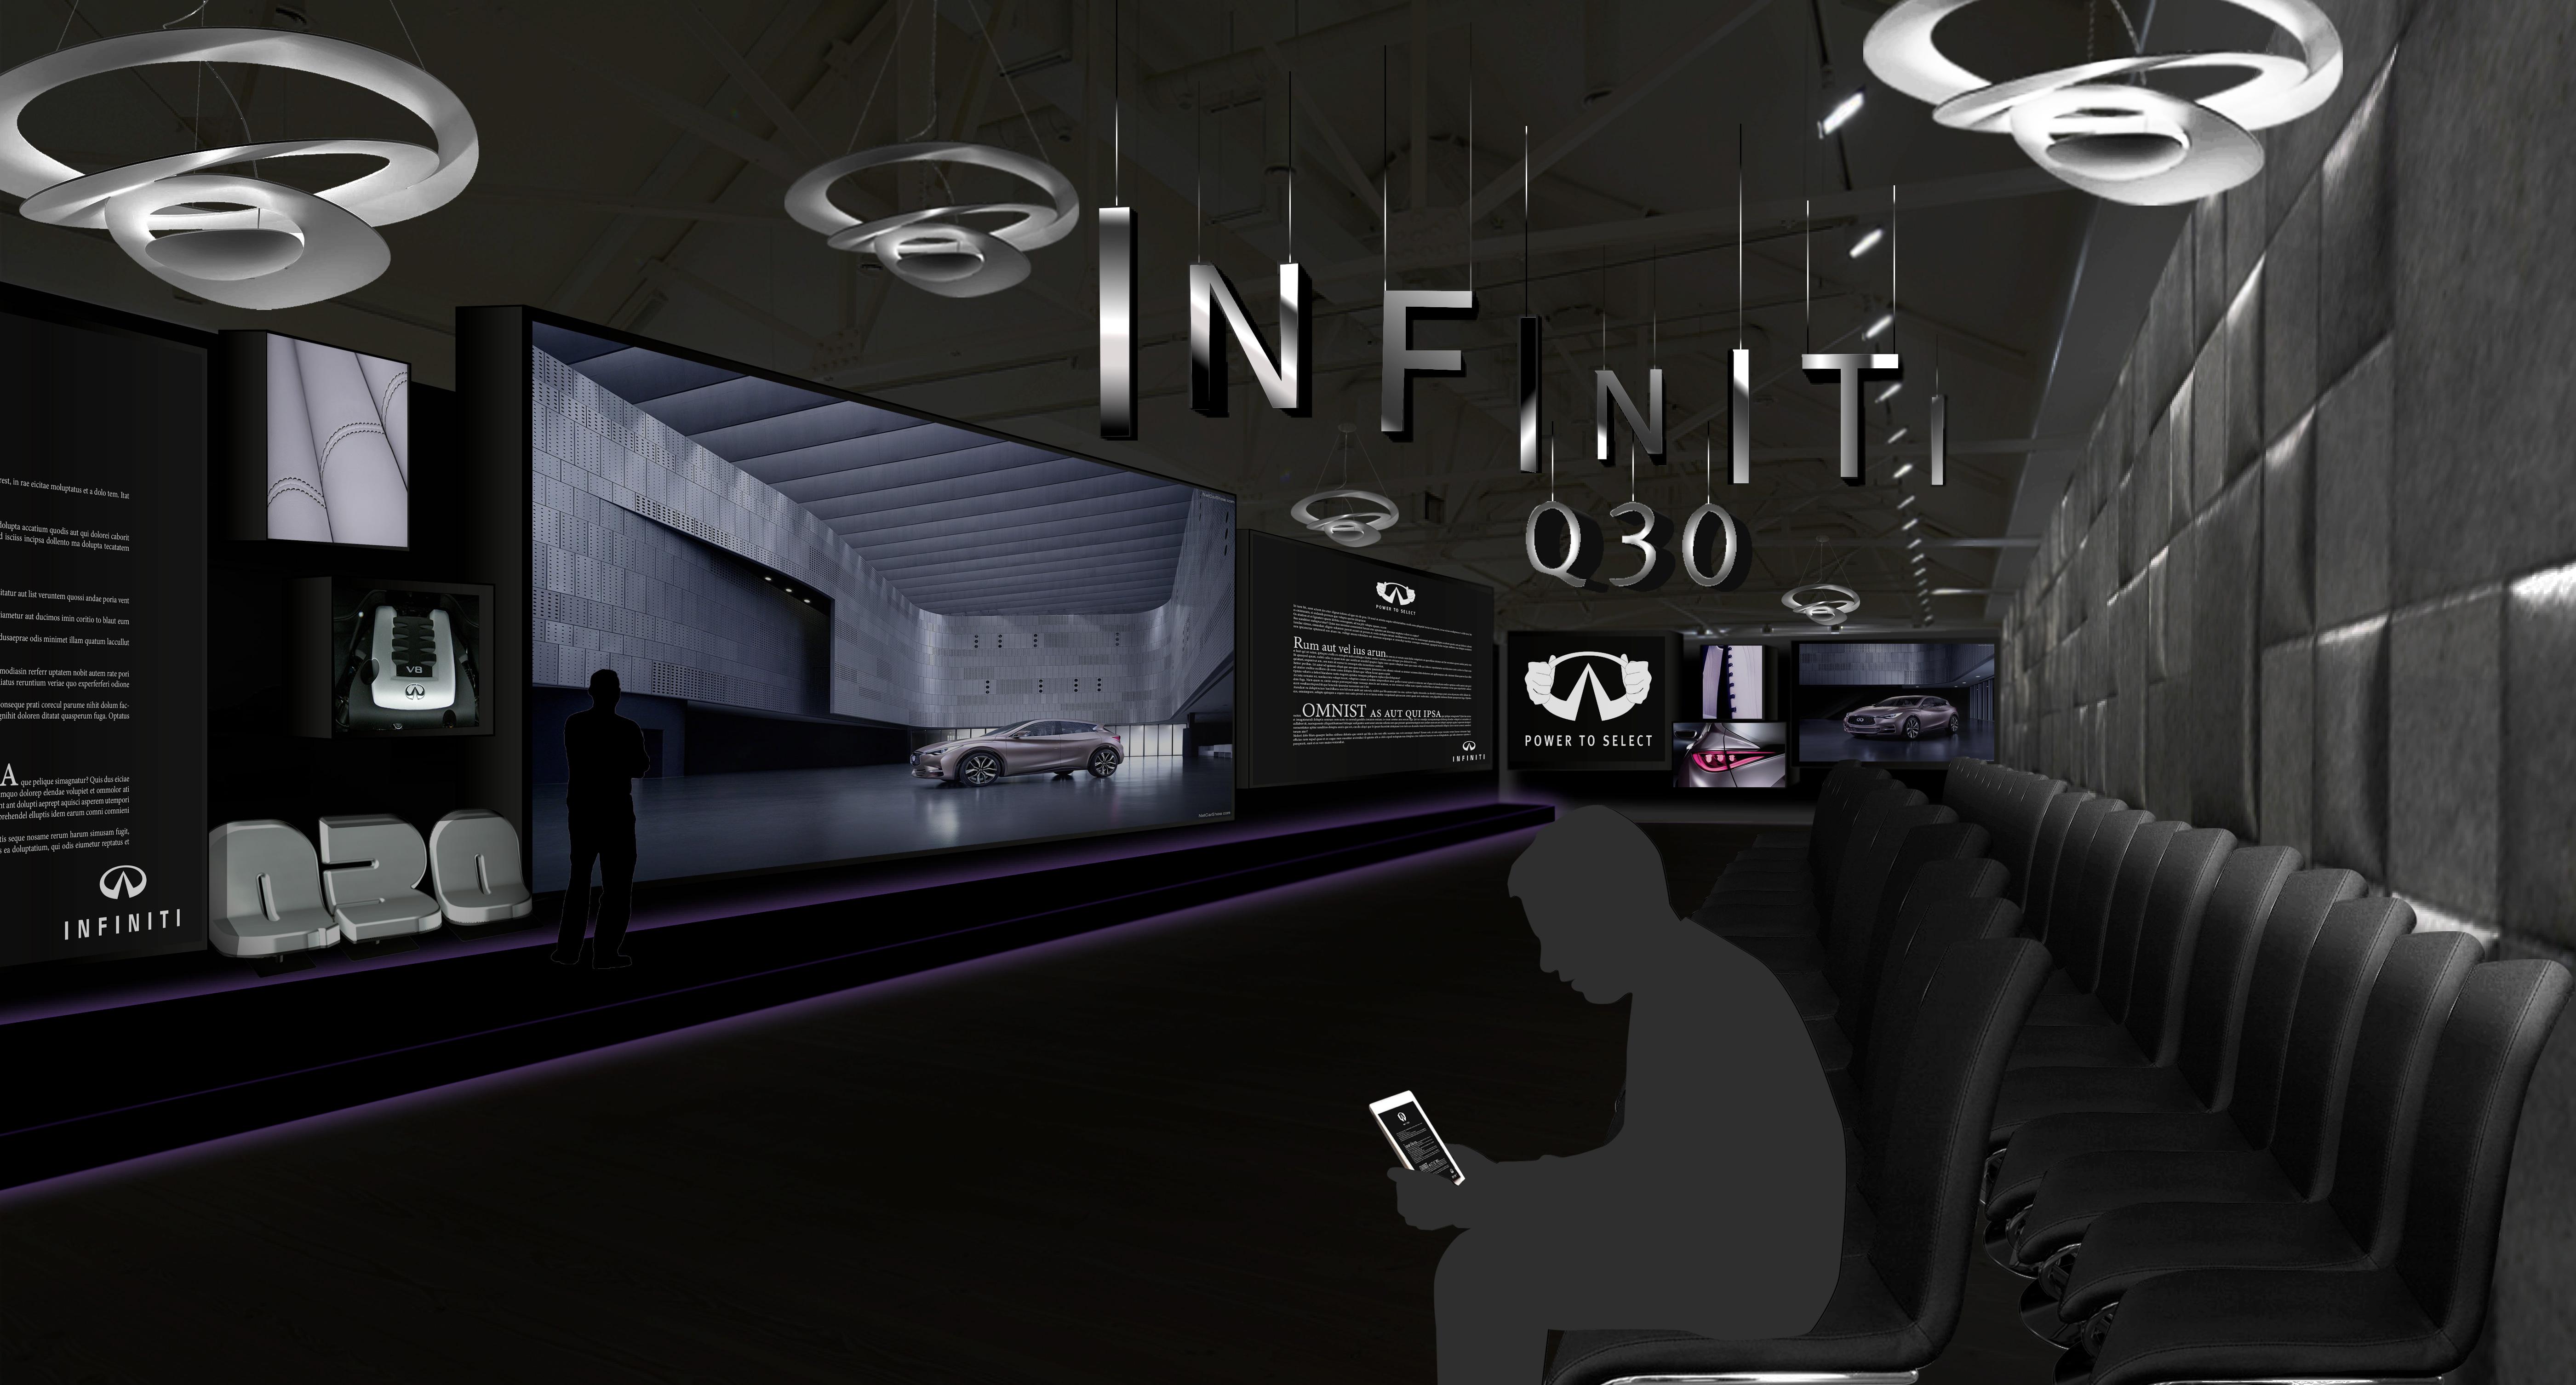 Infiniti-Saatchi Gallery